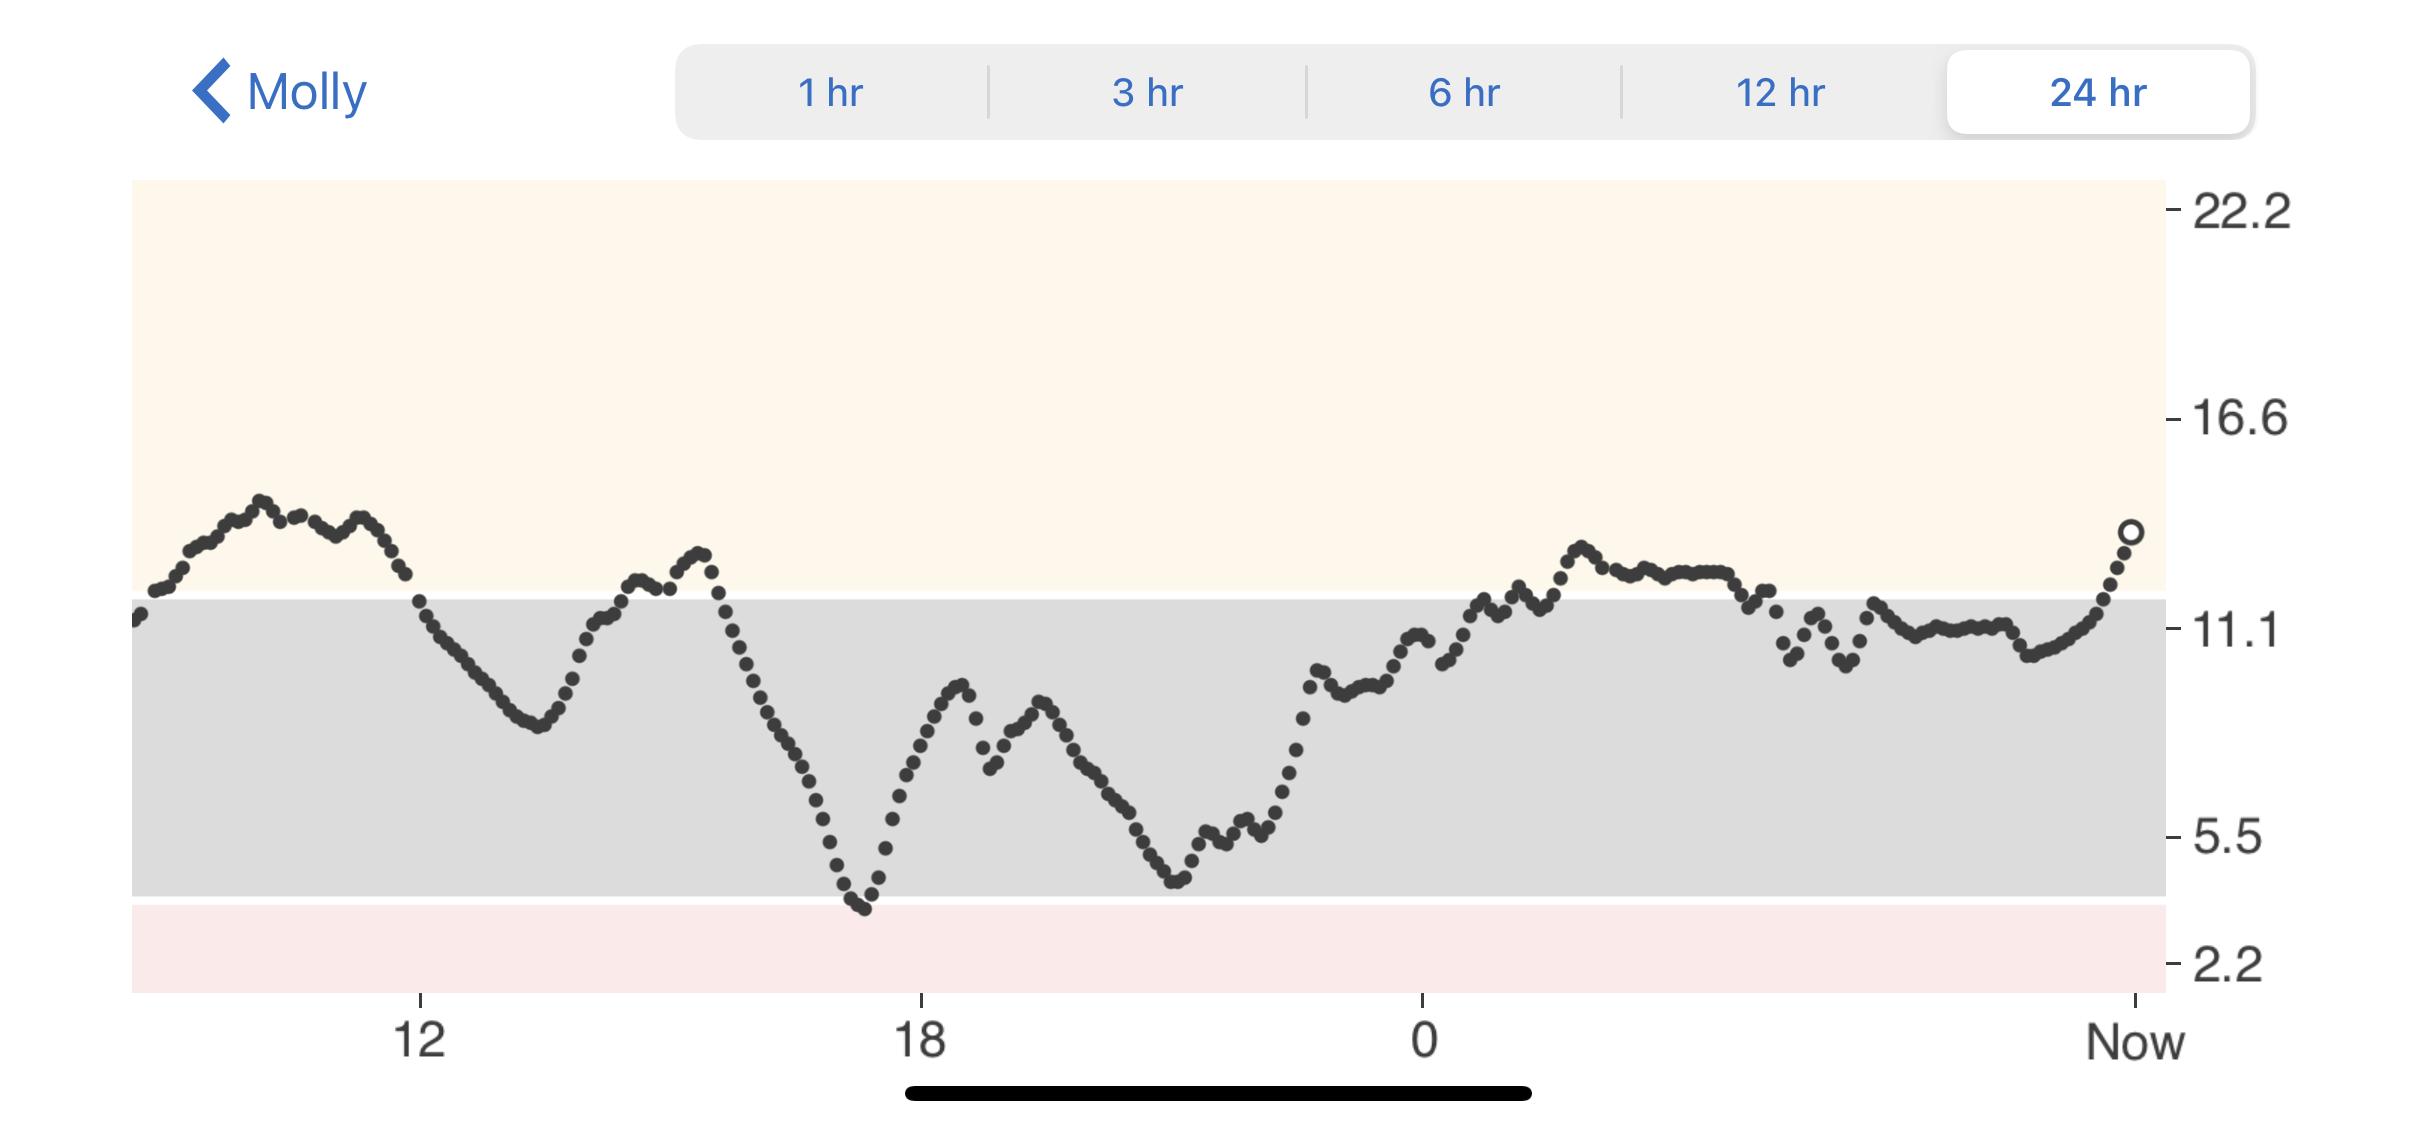 Type 1 Diabetes, a Dexcom graph